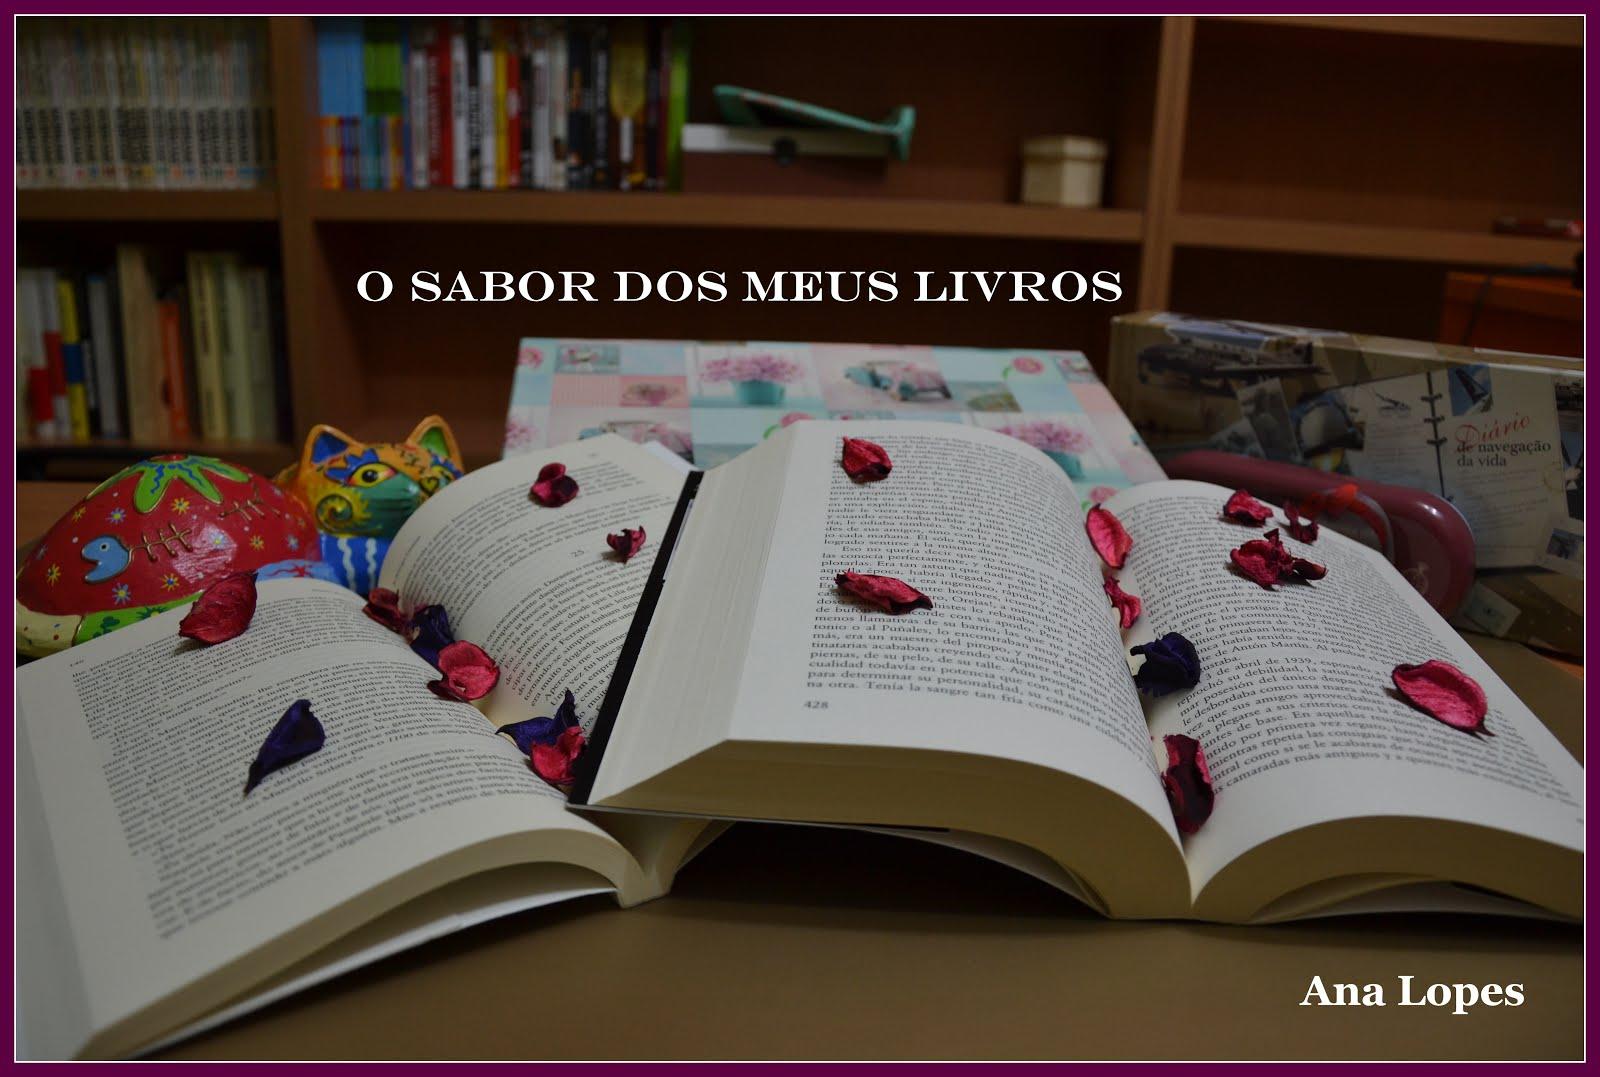 YOUTUBE | O SABOR DOS MEUS LIVROS